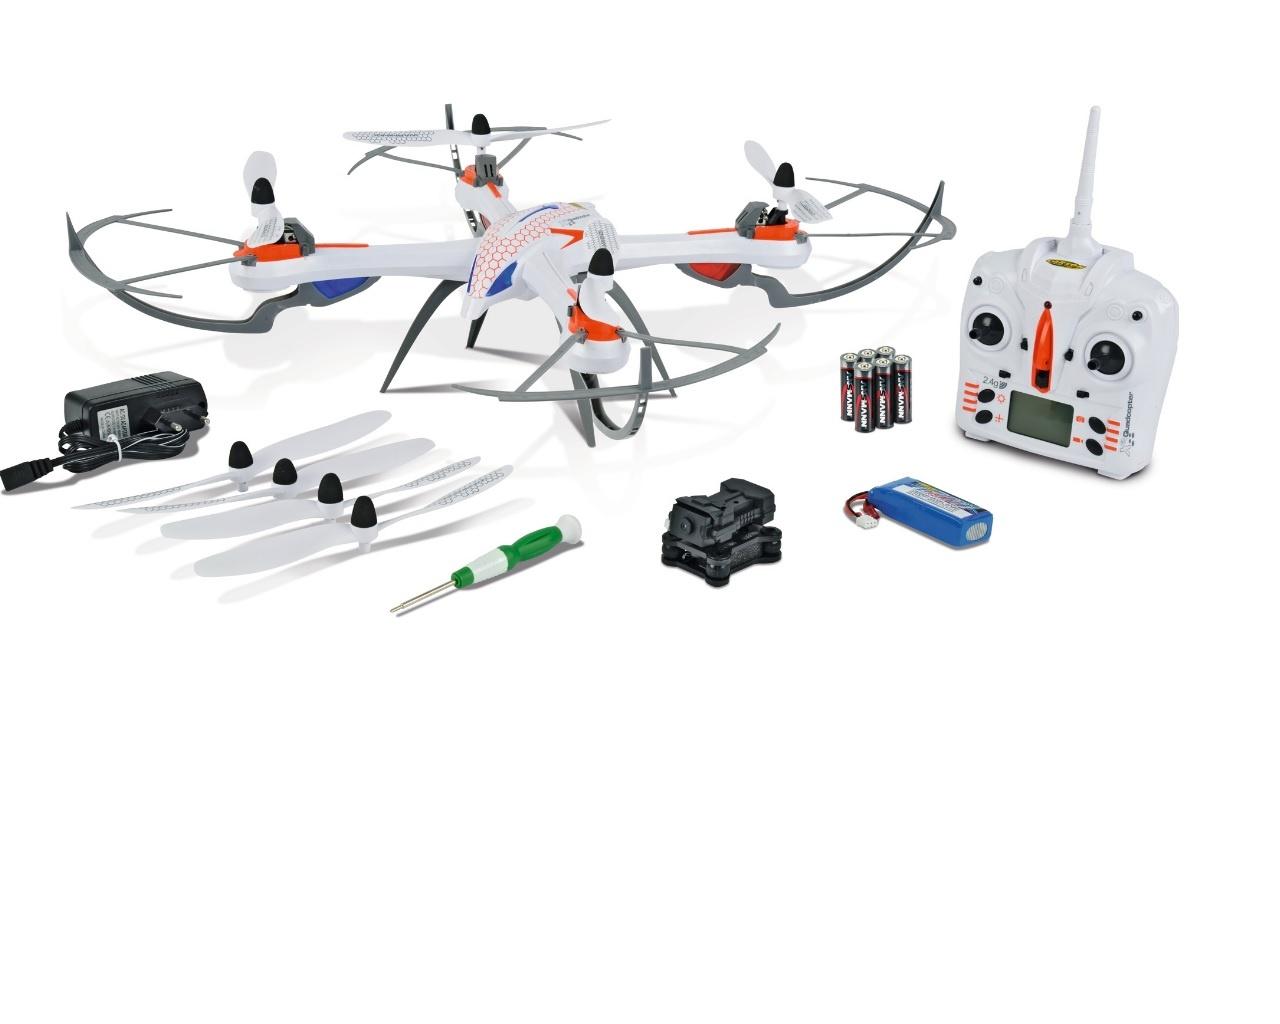 X4 Quadcopter 550 SPY 2.4G 100% RTR